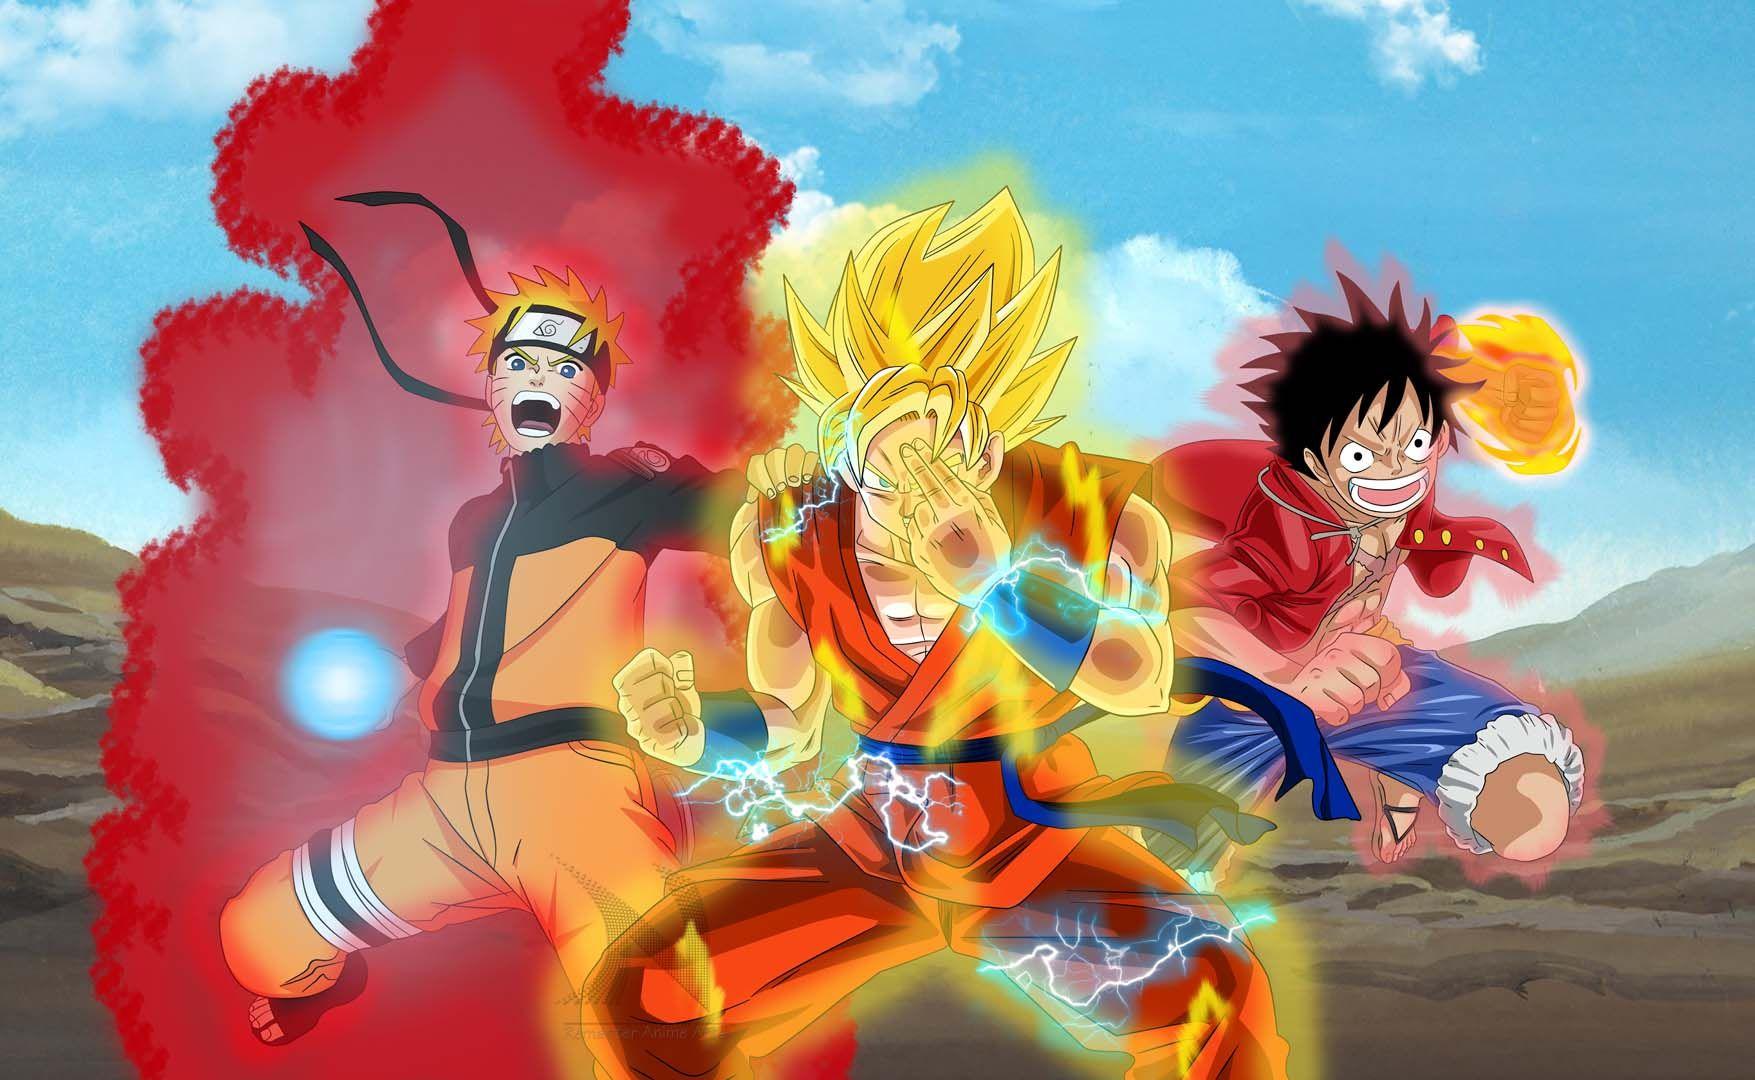 Fond D Ecran One Piece Naruto Fond Ecran Anime Luffy